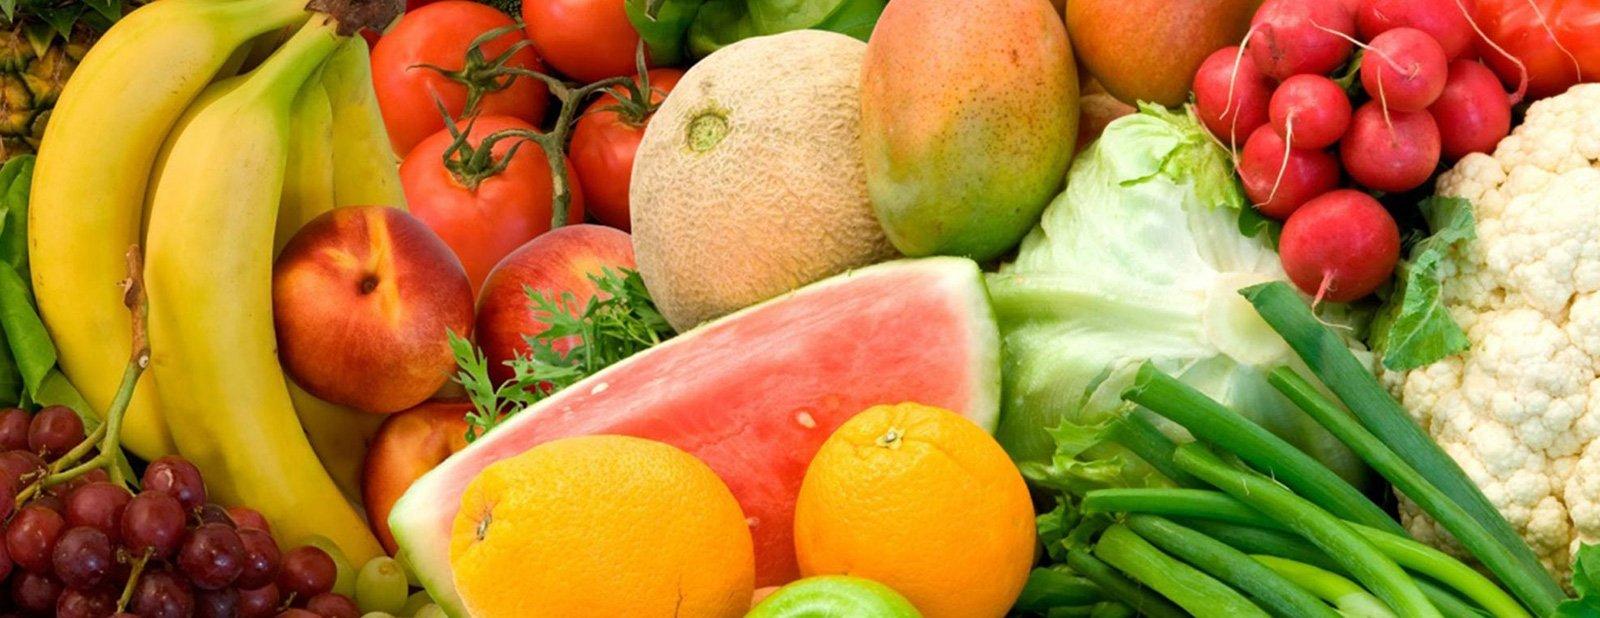 Abdul Aziz Trading - Supplier of Fresh Fruits & Vegetable in